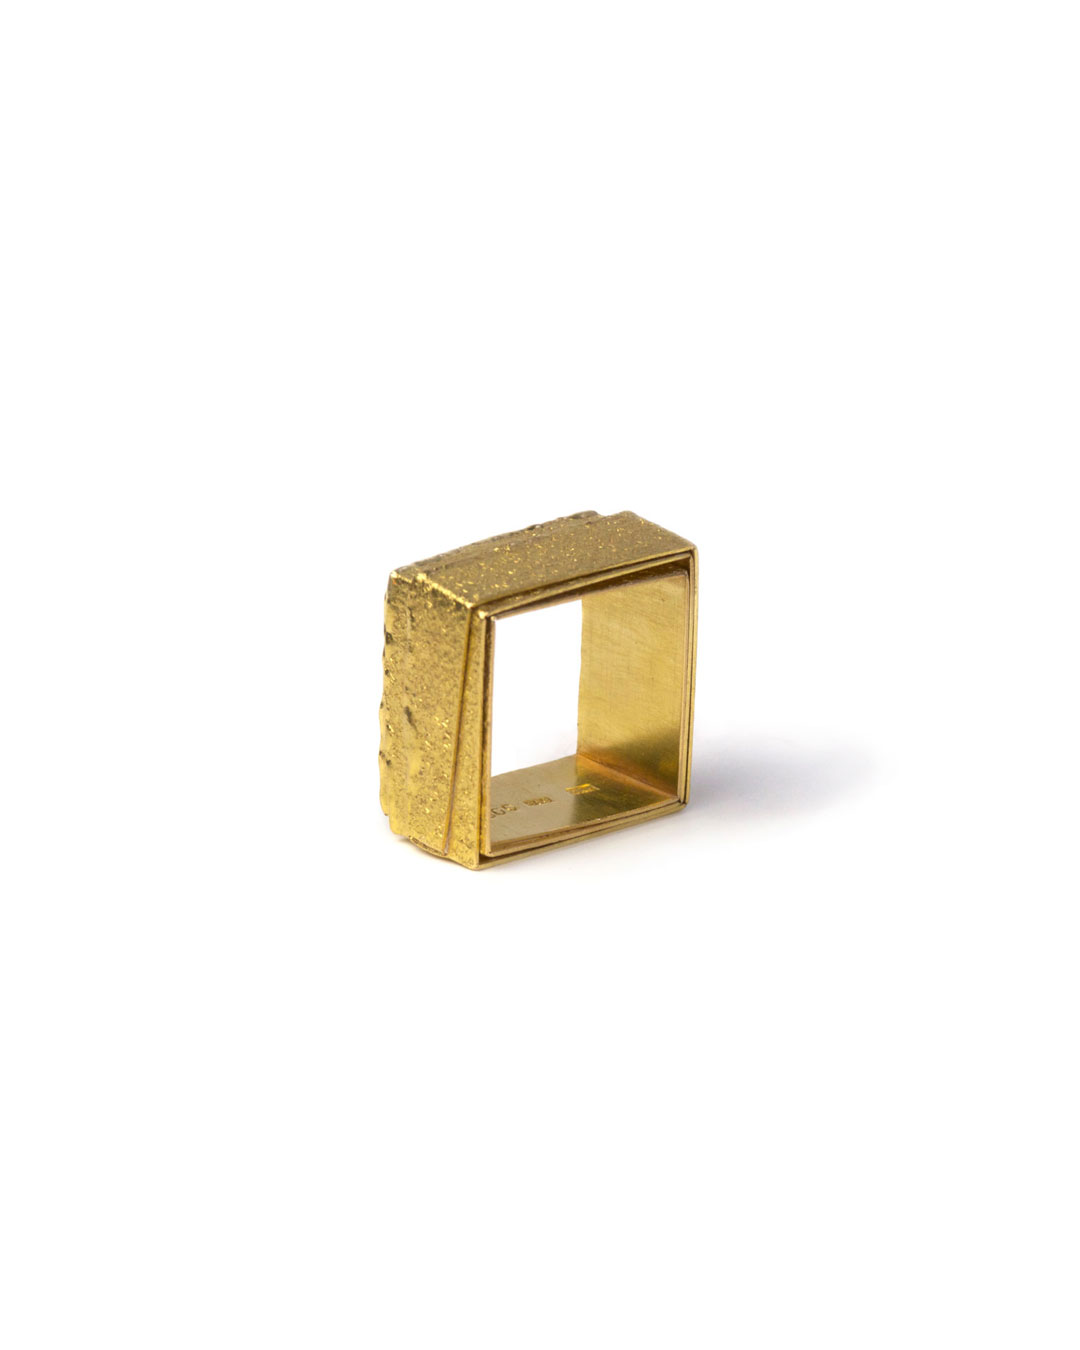 Okinari Kurokawa, untitled, 1998, ring; 18ct gold, 20 x 20  x 12 mm